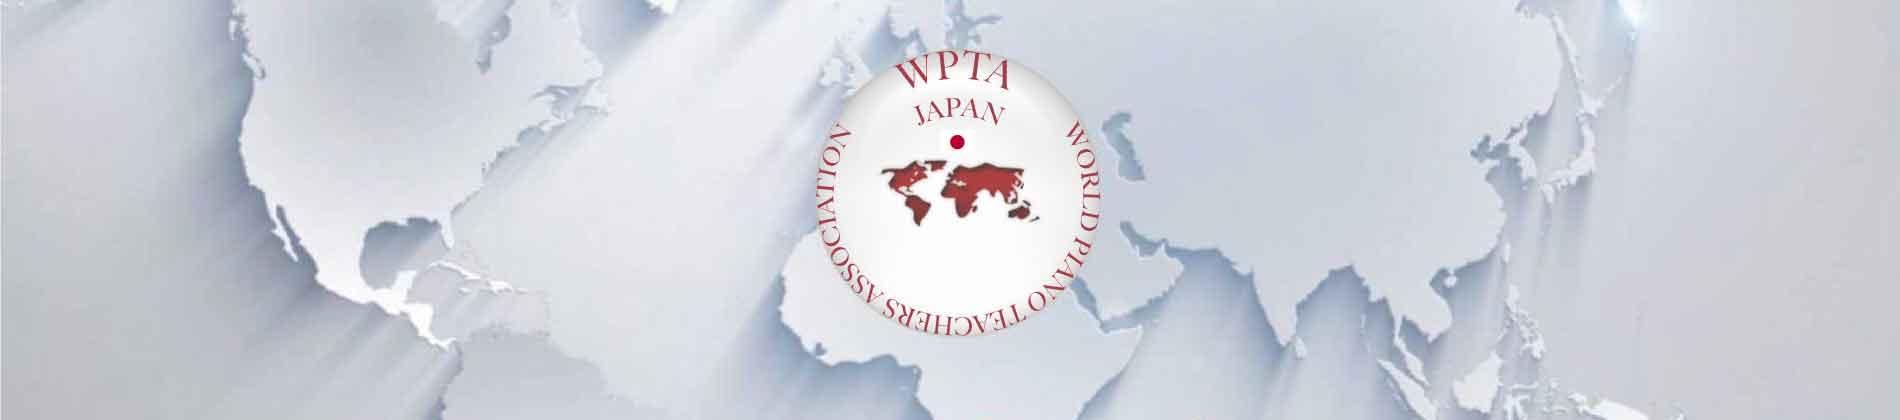 WPTA 国際ピアノ指導者連盟 日本